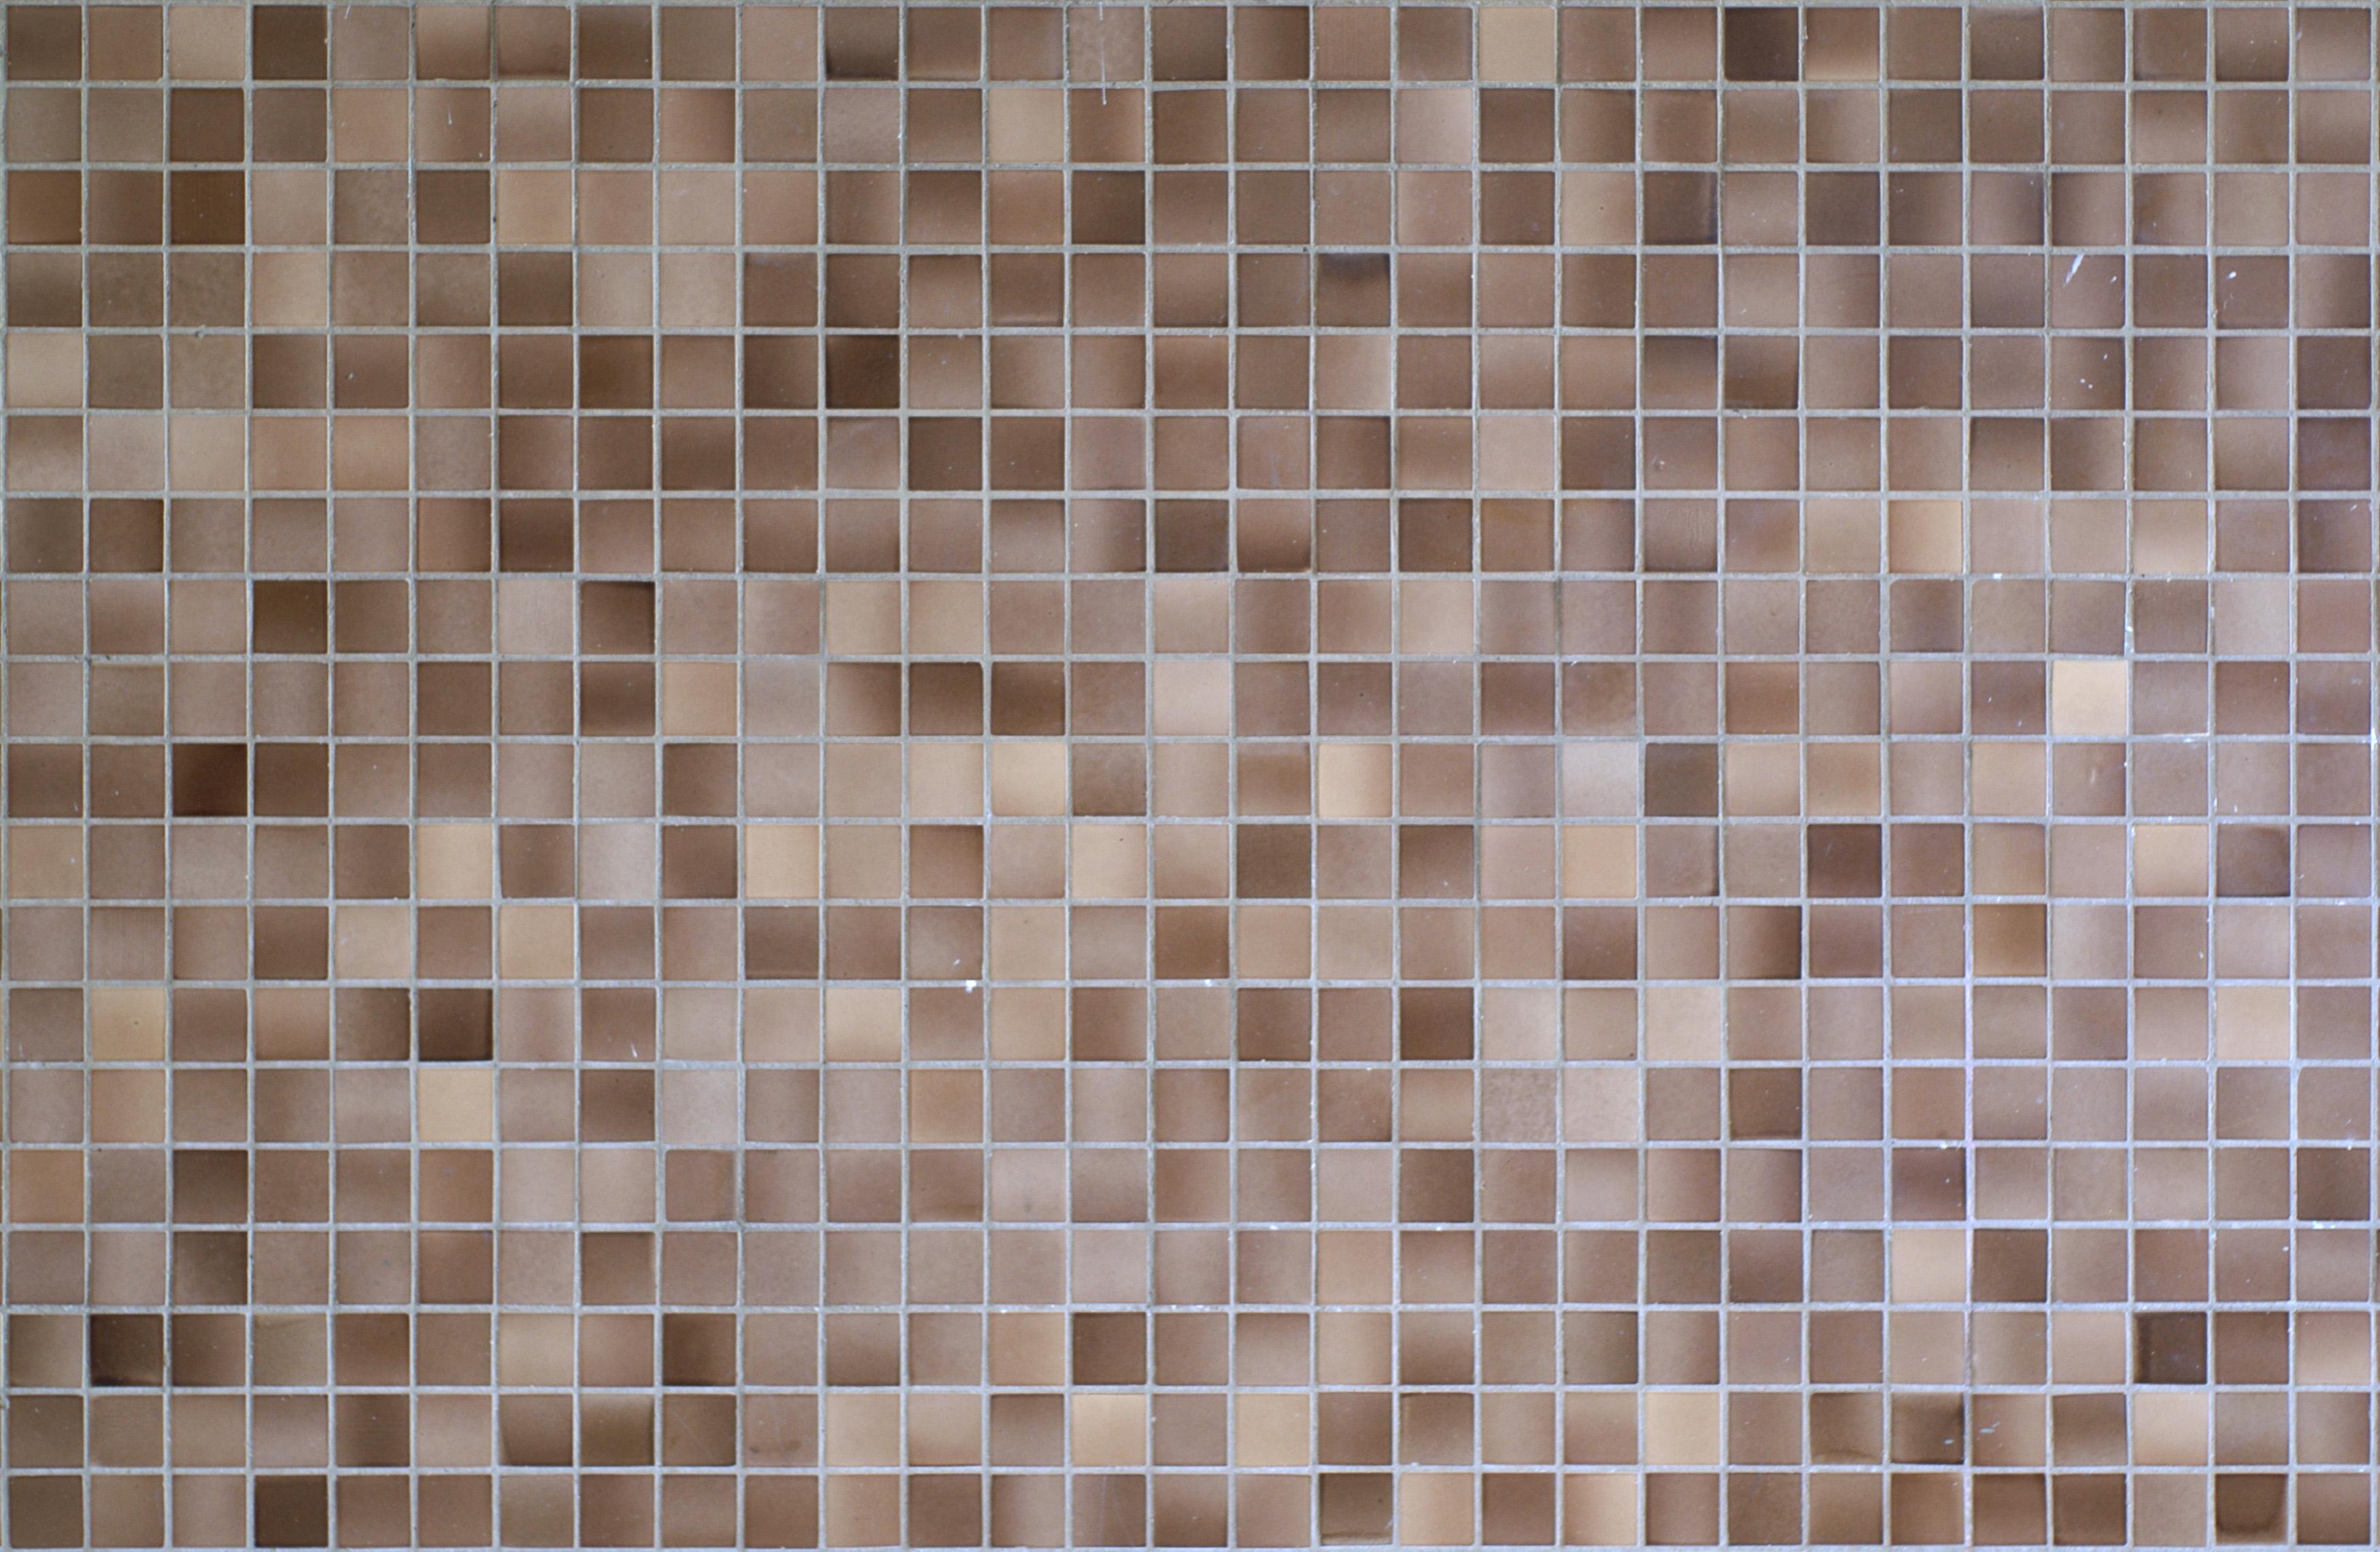 mosaic, texture, download photo, background, mosaic texture, background